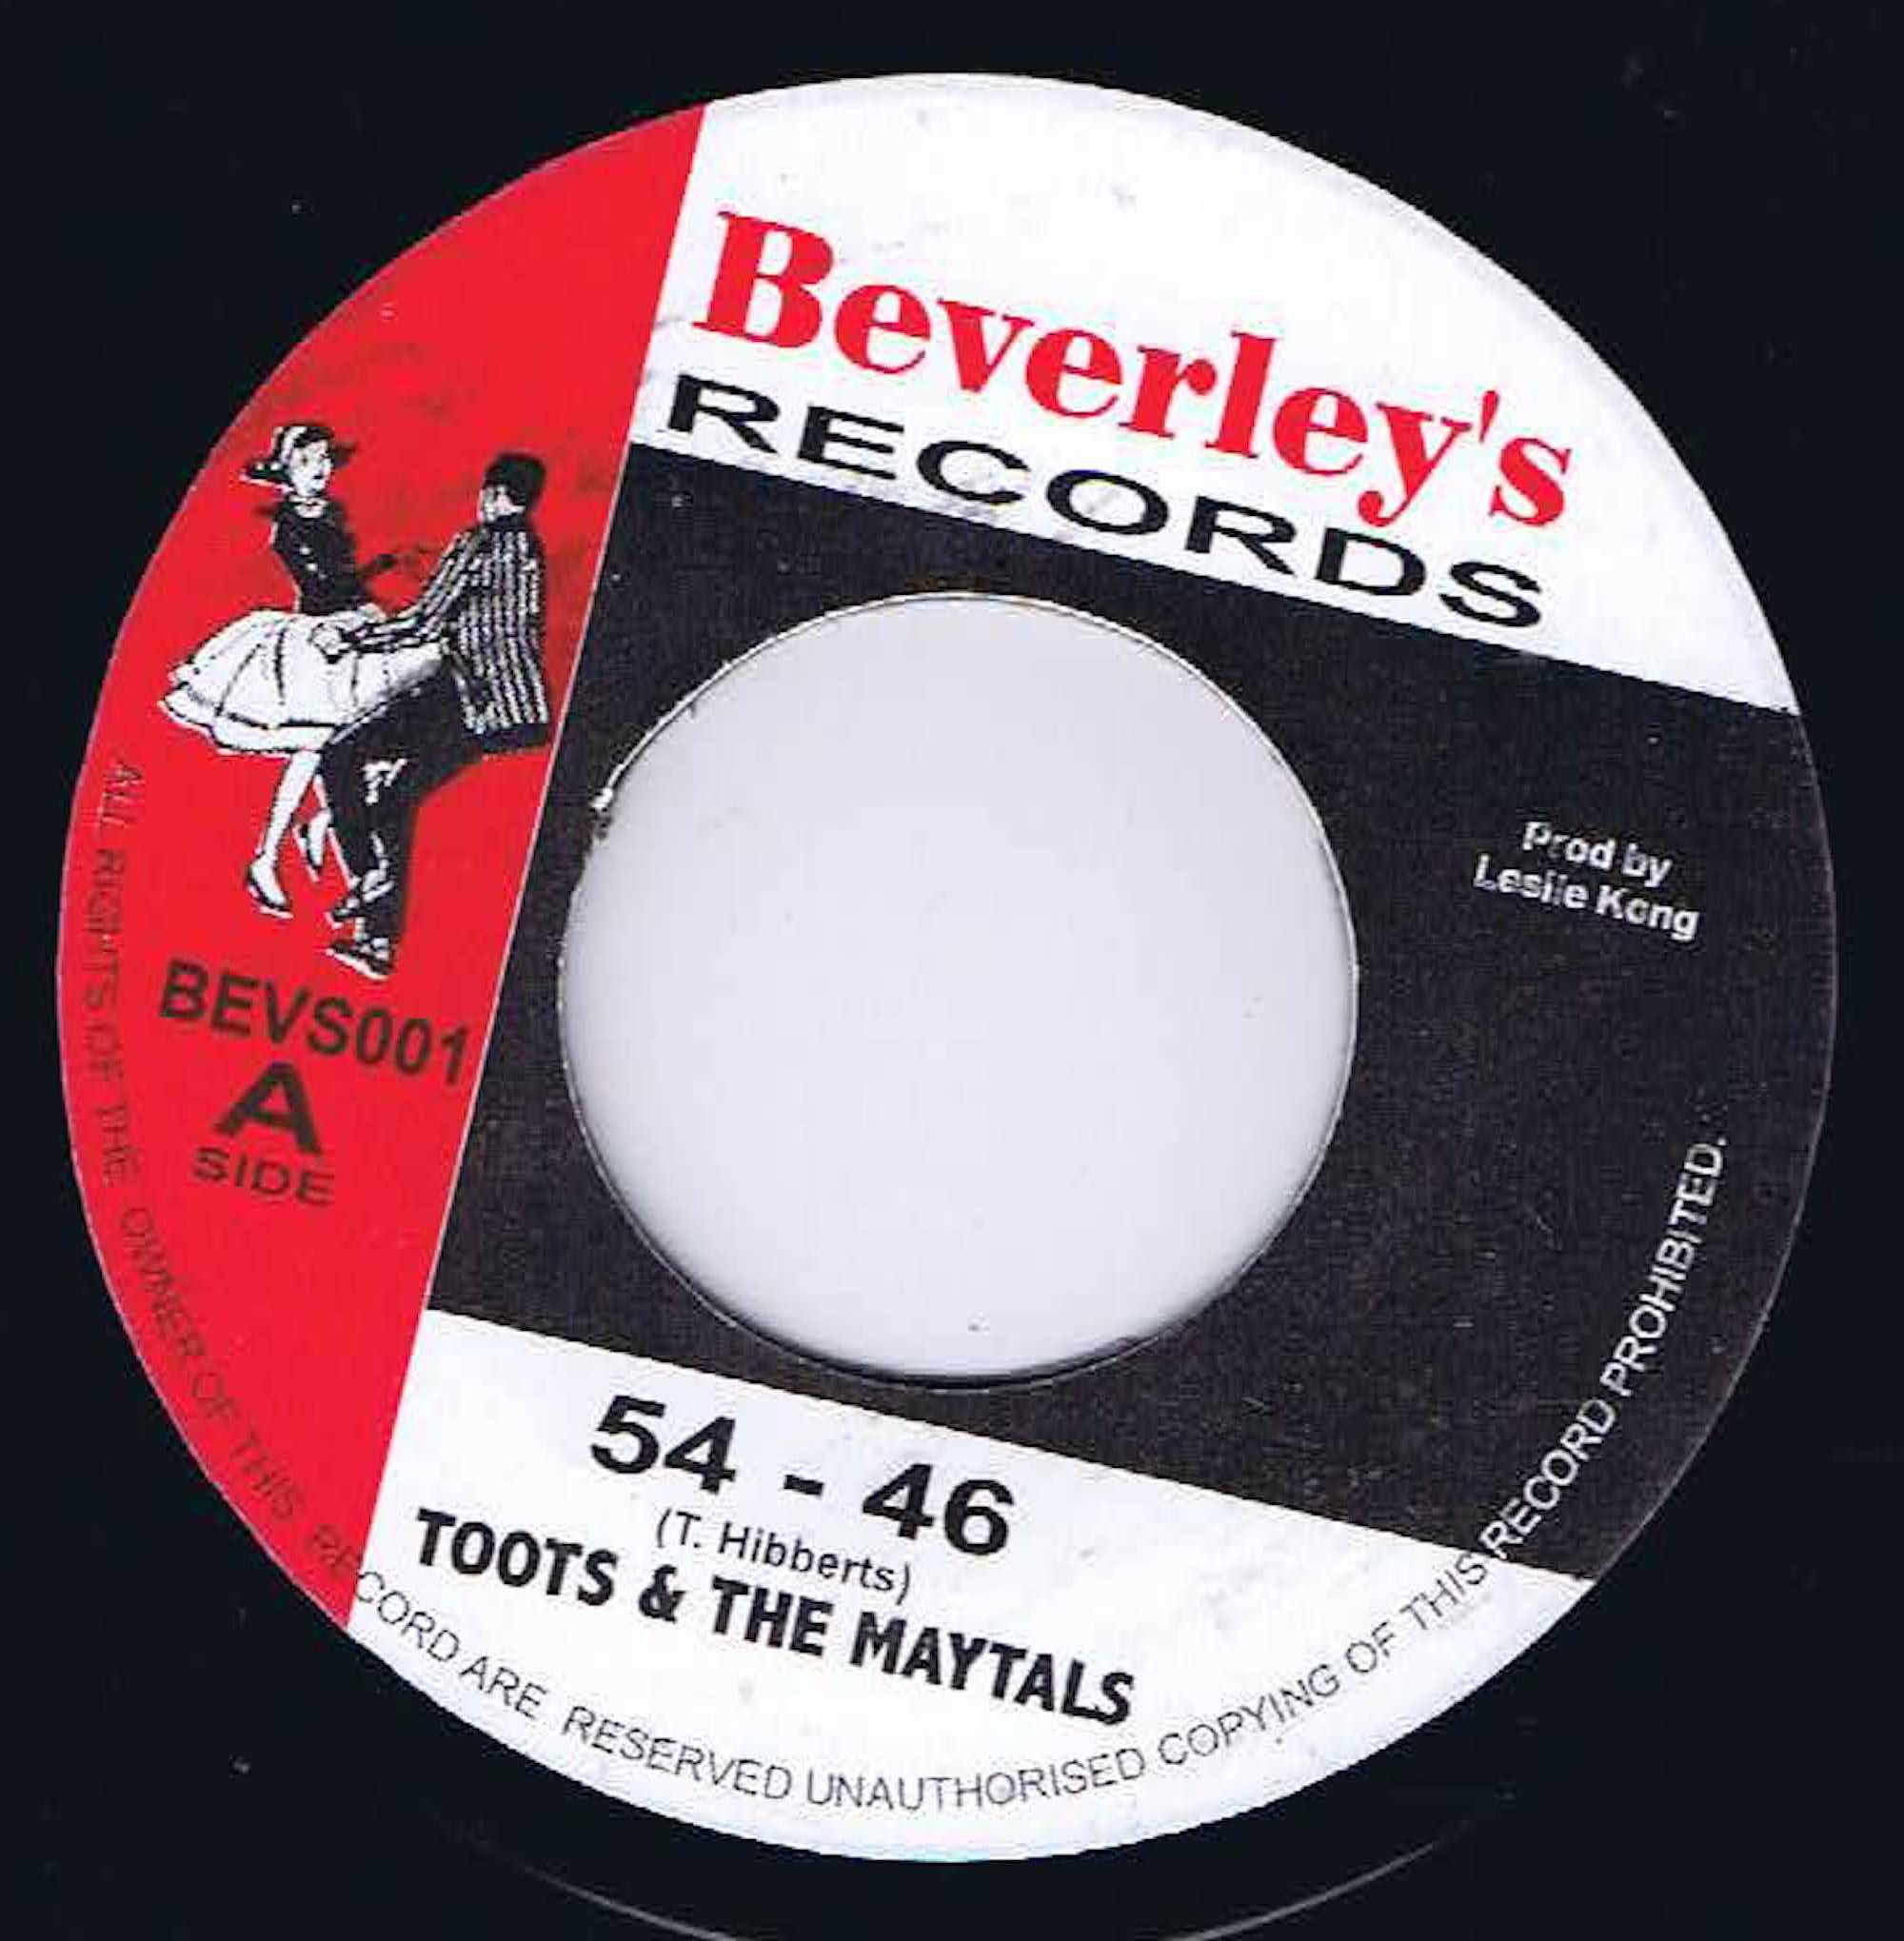 Toots & The Maytals – 54 - 46 / Pressure Drop - BEVS001 - 7-inch Vinyl  Record